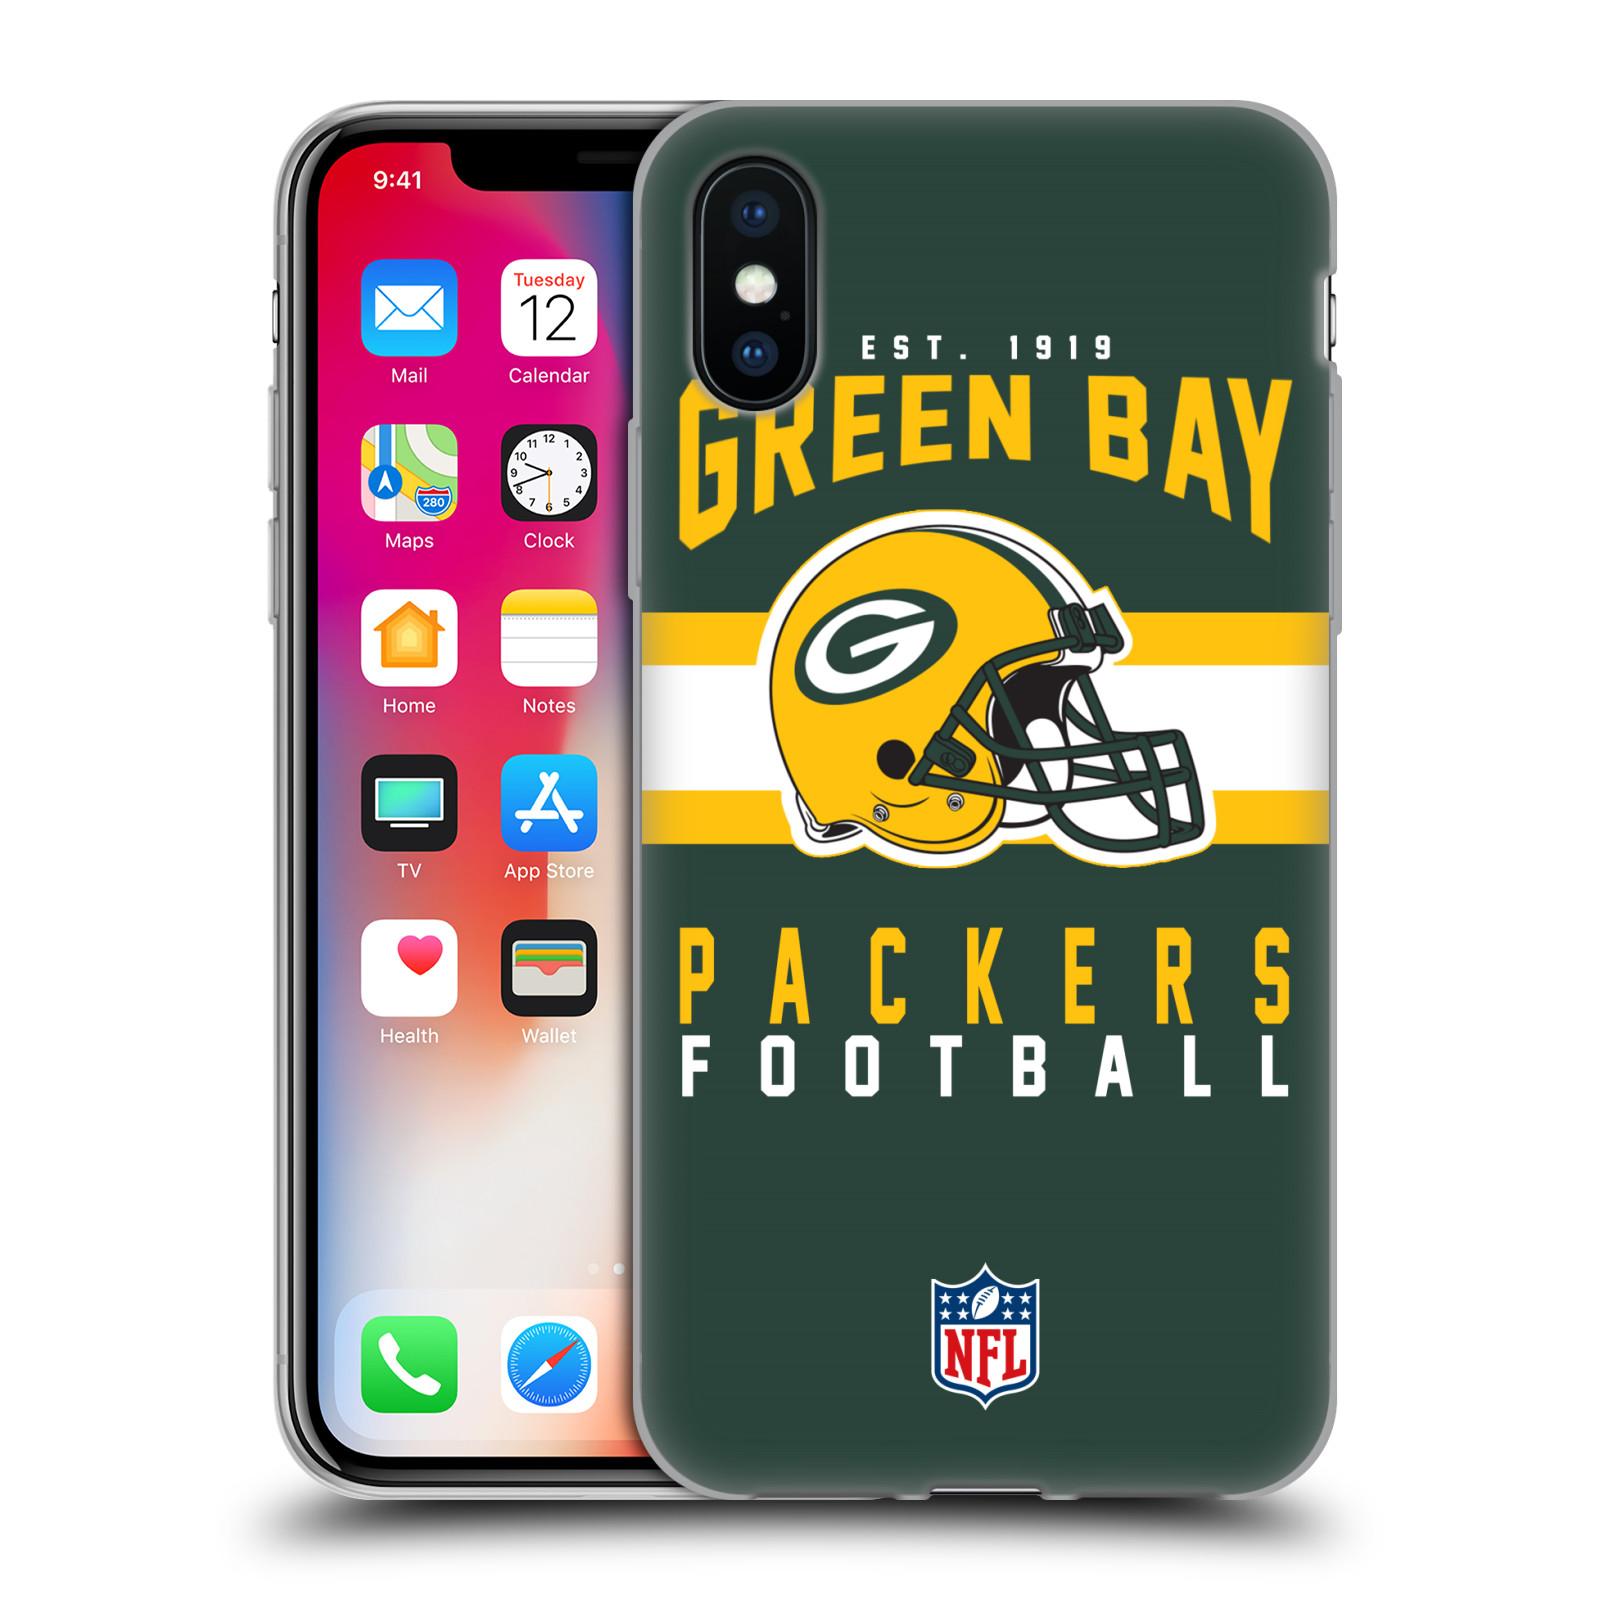 UFFICIALE-NFL-2018-19-GREEN-BAY-PACKERS-CASE-IN-GEL-PER-APPLE-iPHONE-TELEFONI